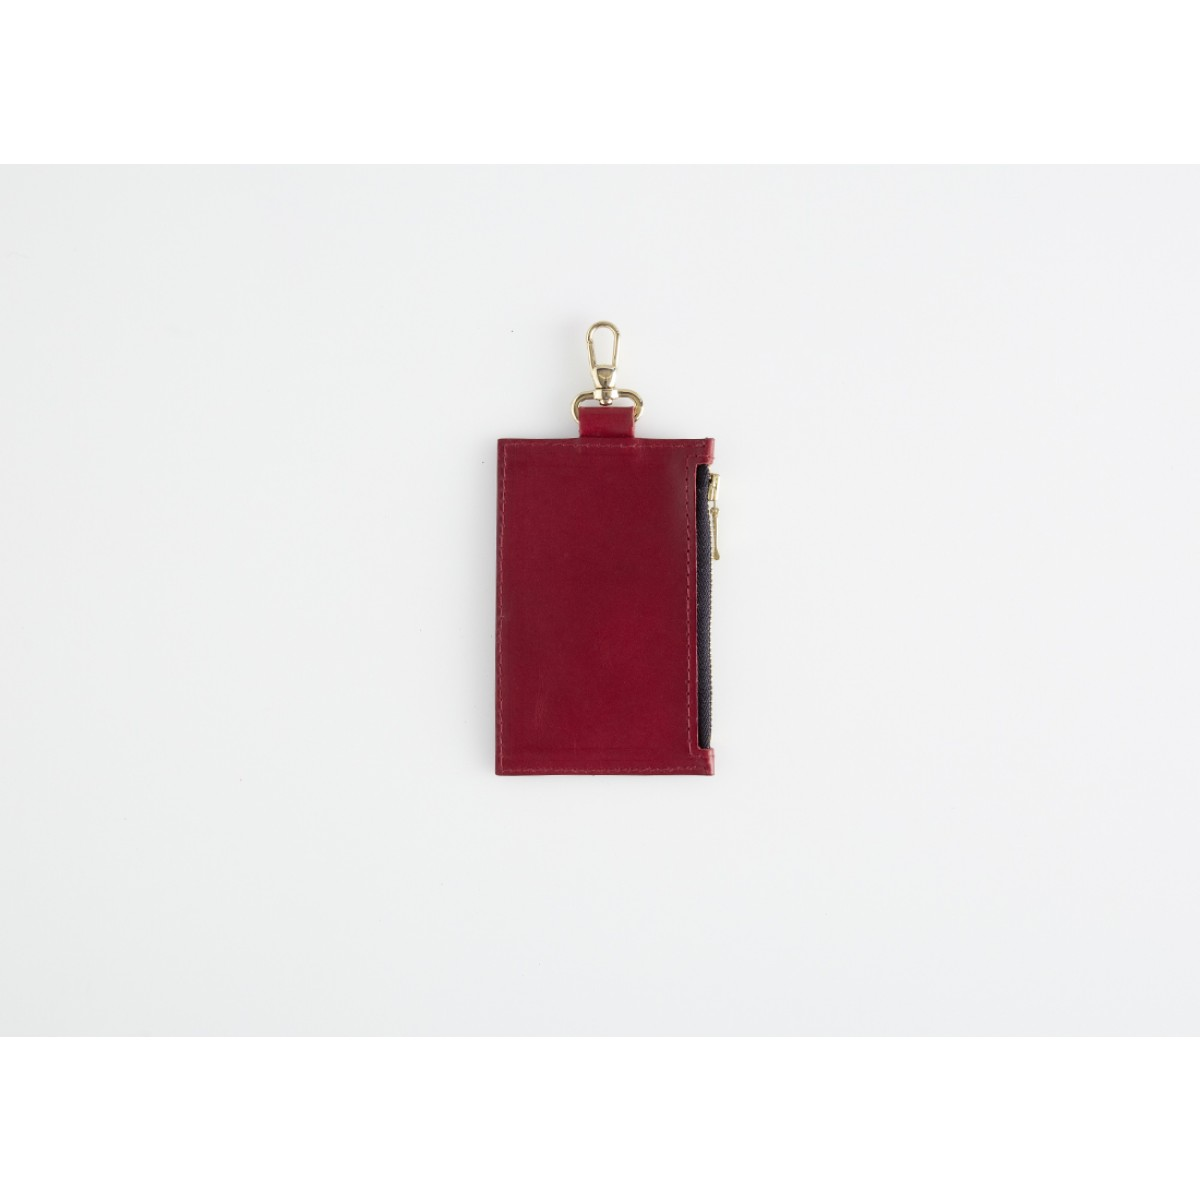 Mini-Lederportemonnaie mit Karabiner, rot